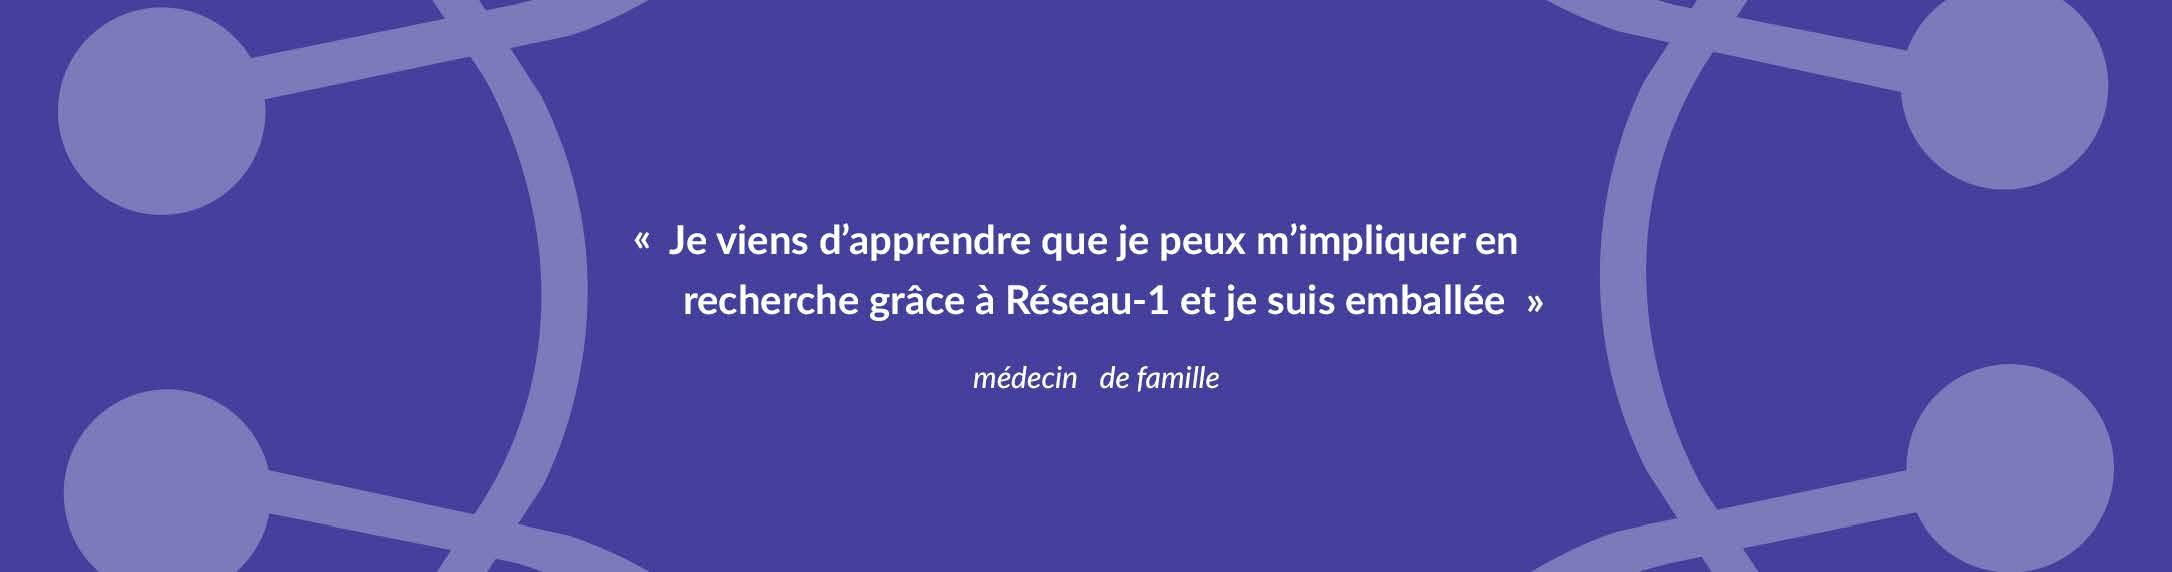 Banière_medecin_famille